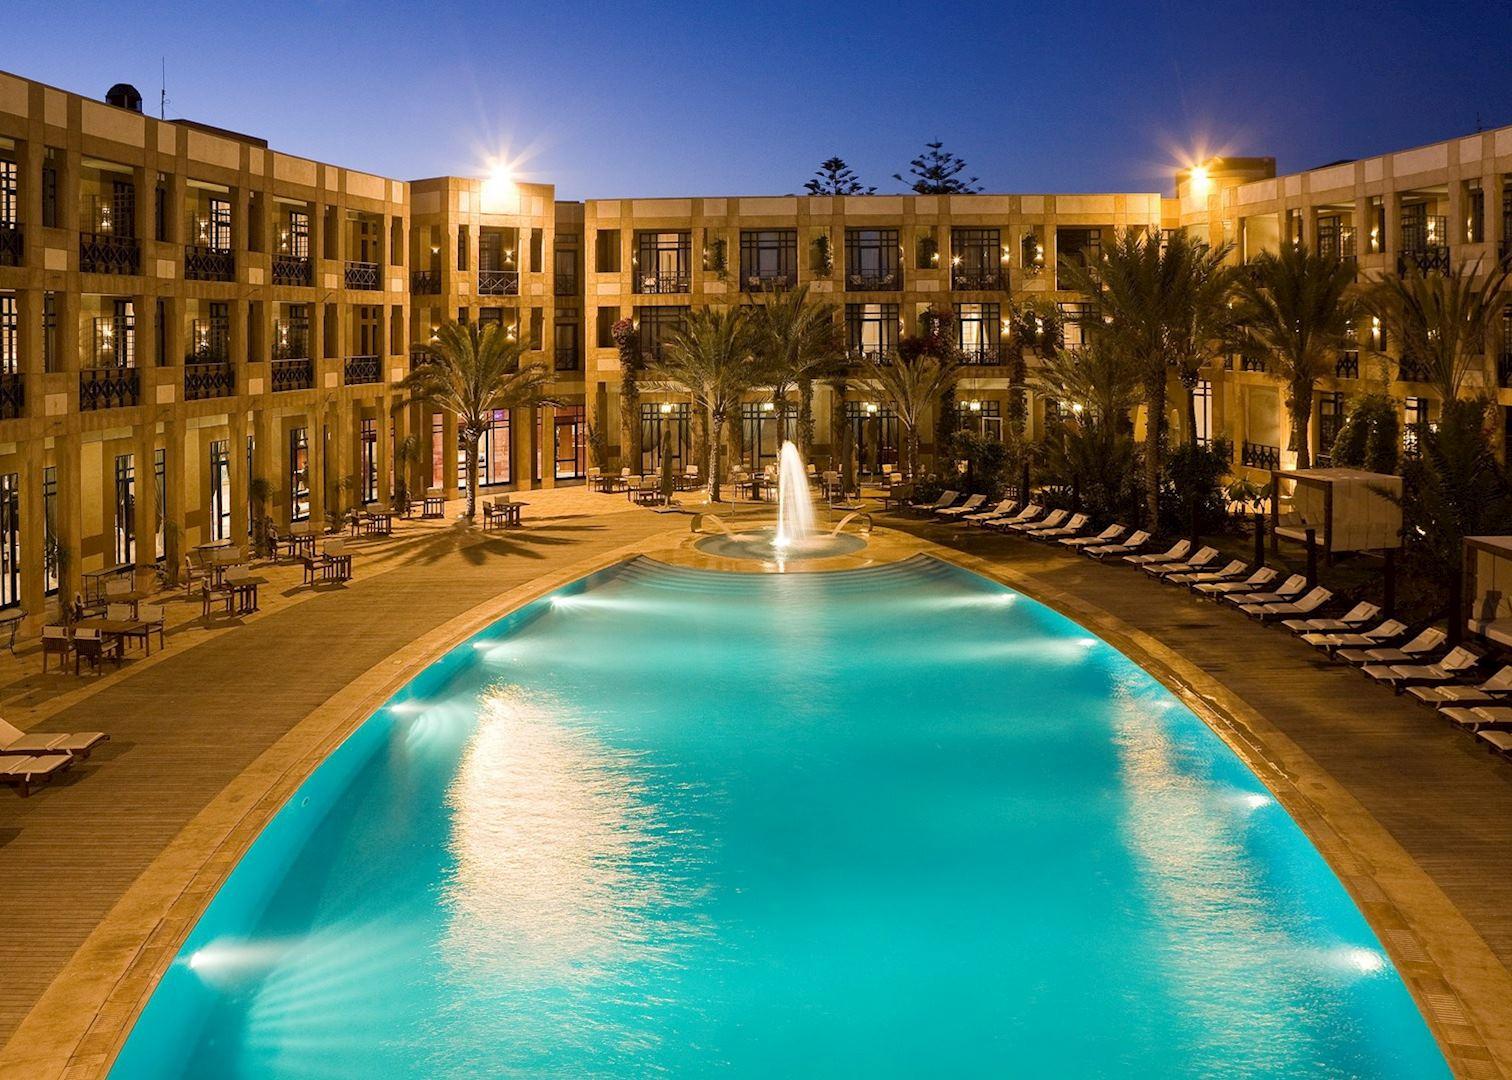 Le Medina Essaouira Hotel Essaouira Audley Travel